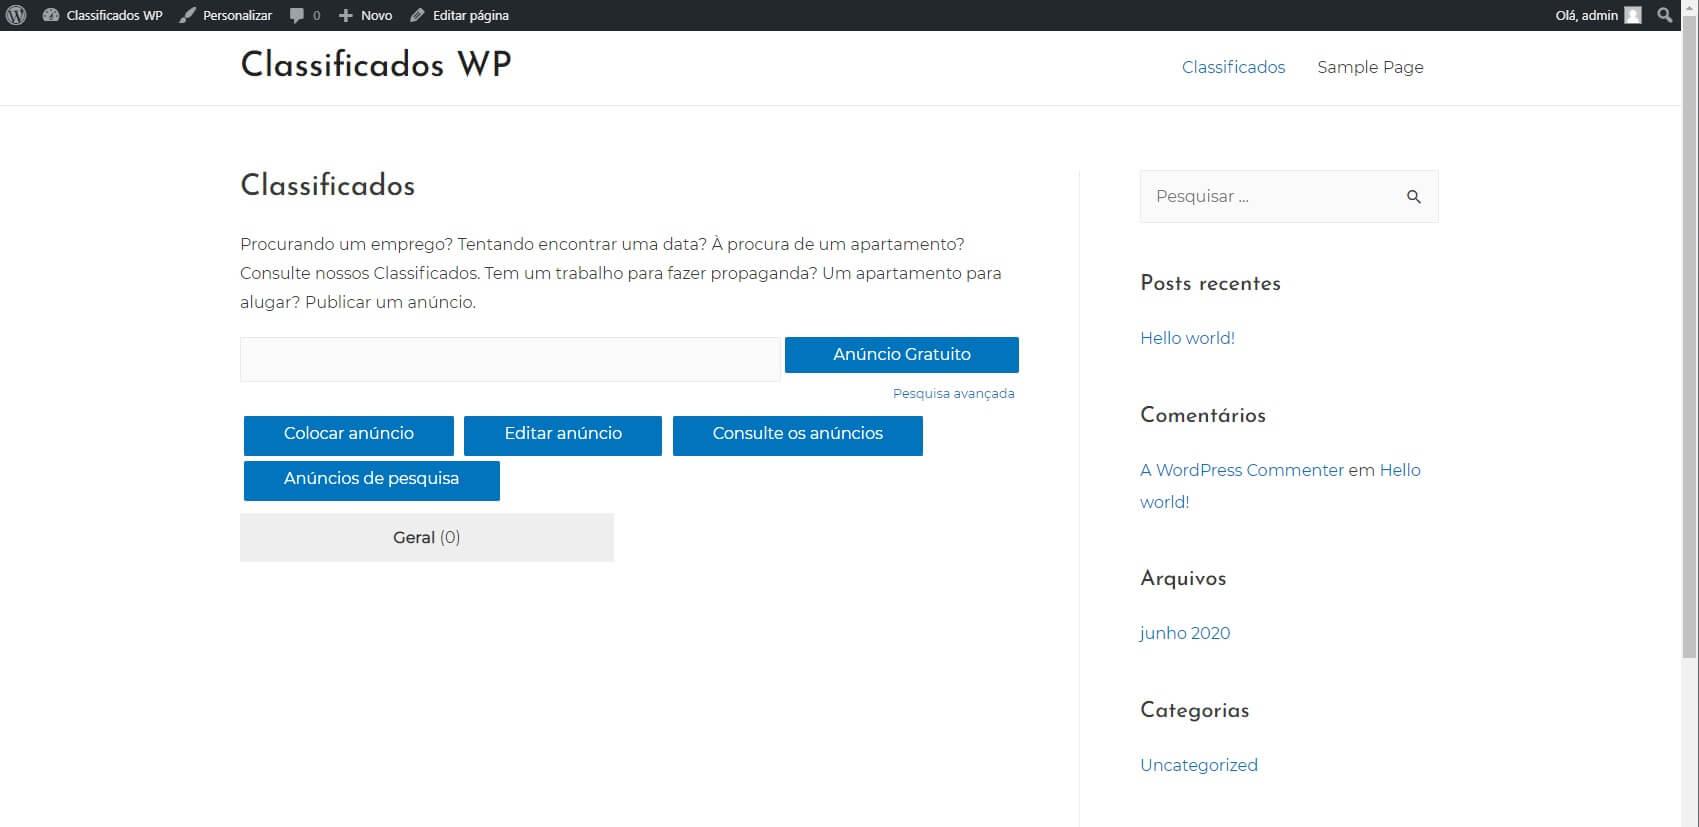 Largura de Conteiner do site Classificados WordPress